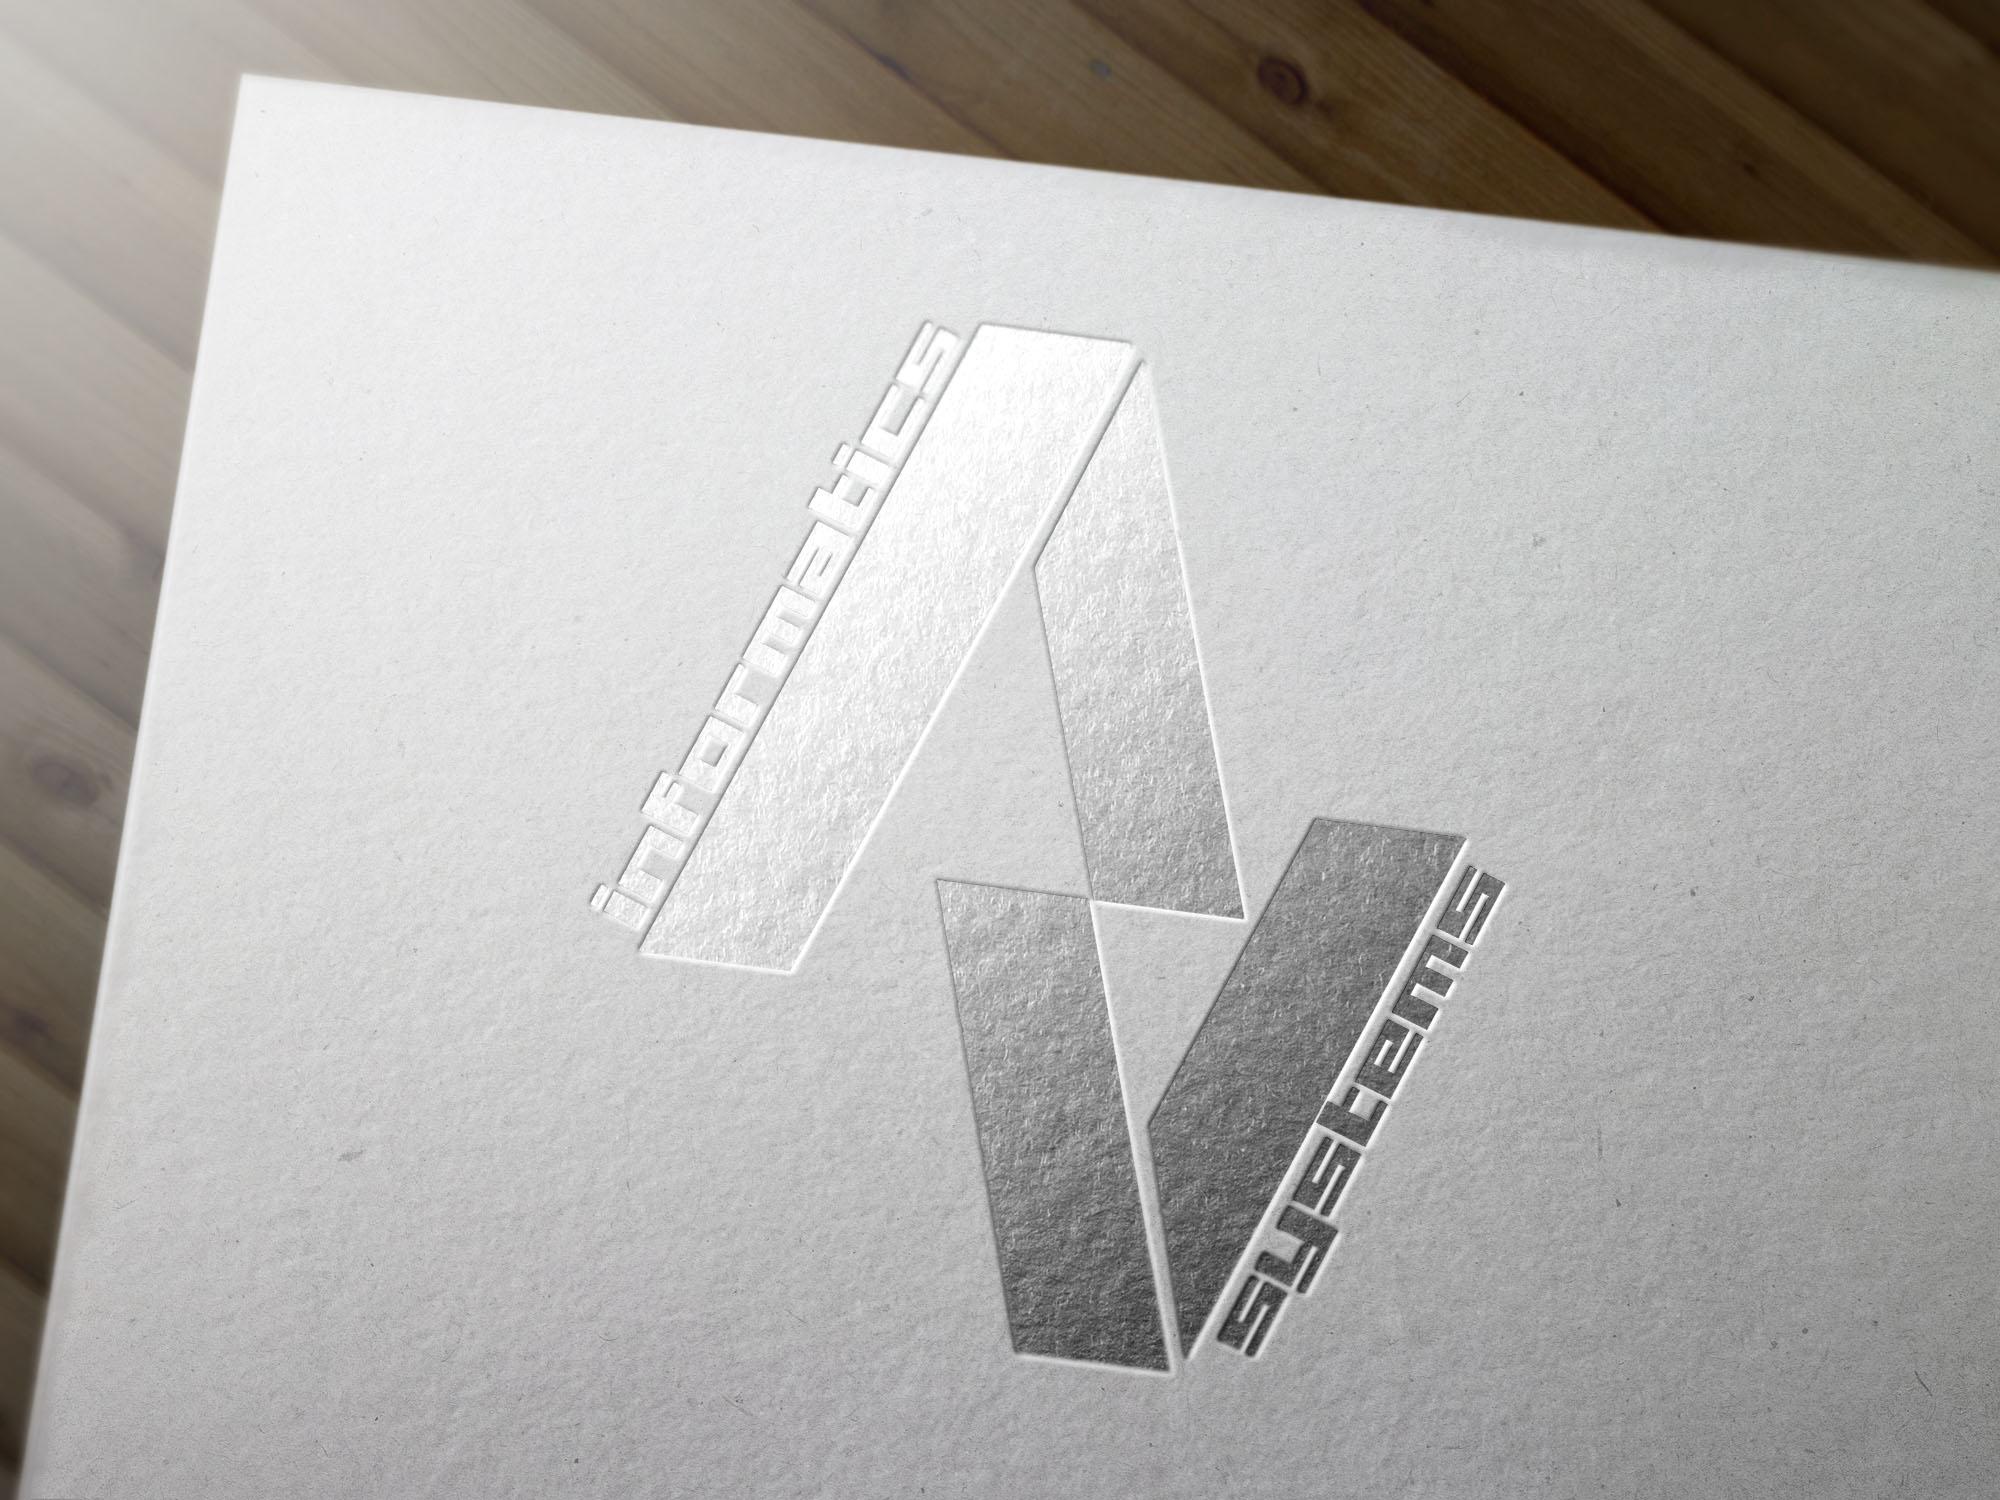 Создание логотипа, фирстиля фото f_7885c5f4f499b0fd.jpg